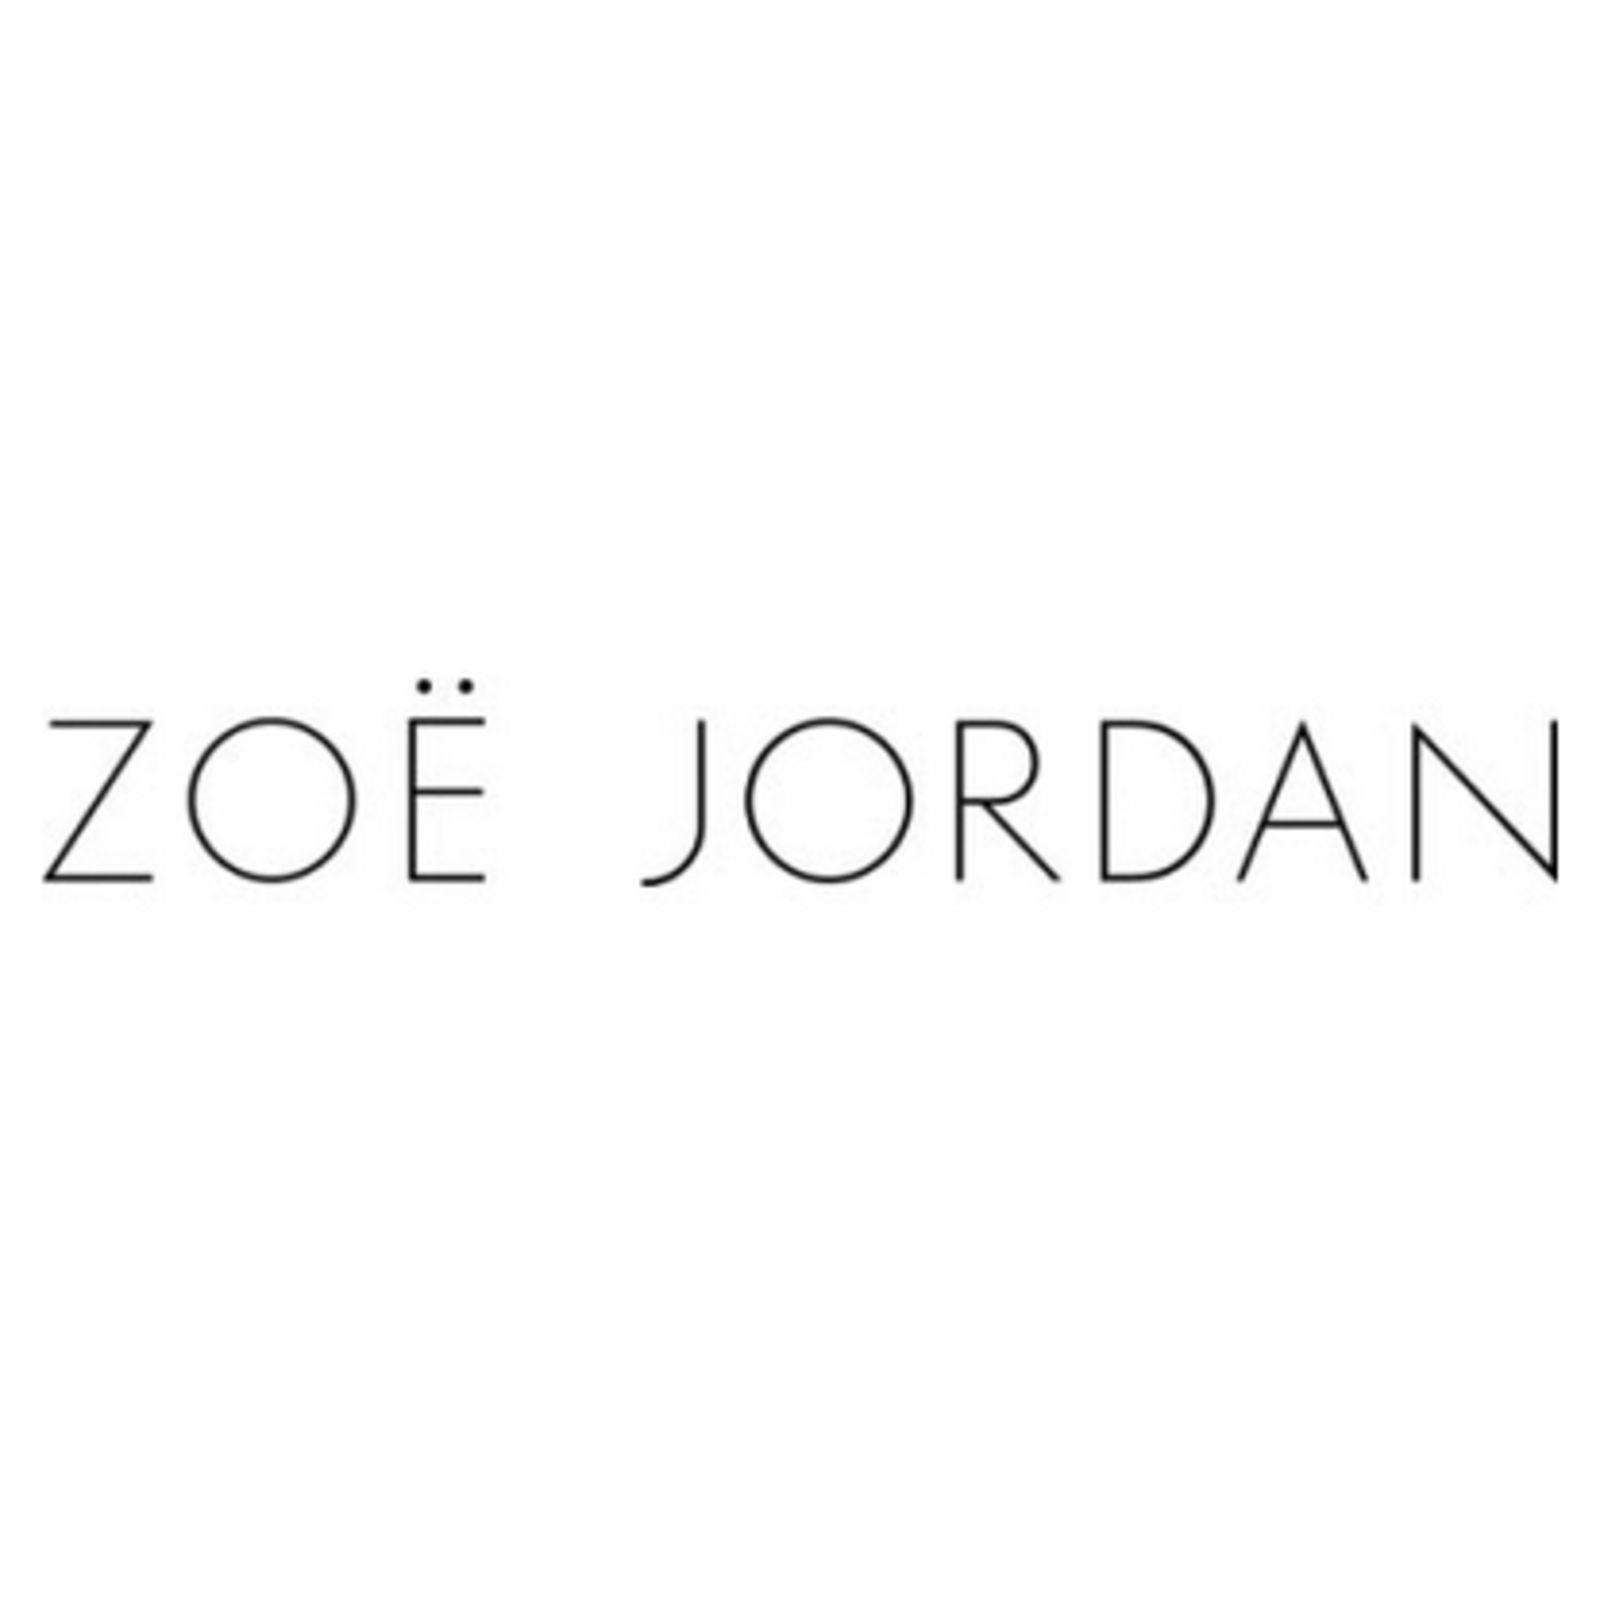 ZOË JORDAN (Image 1)